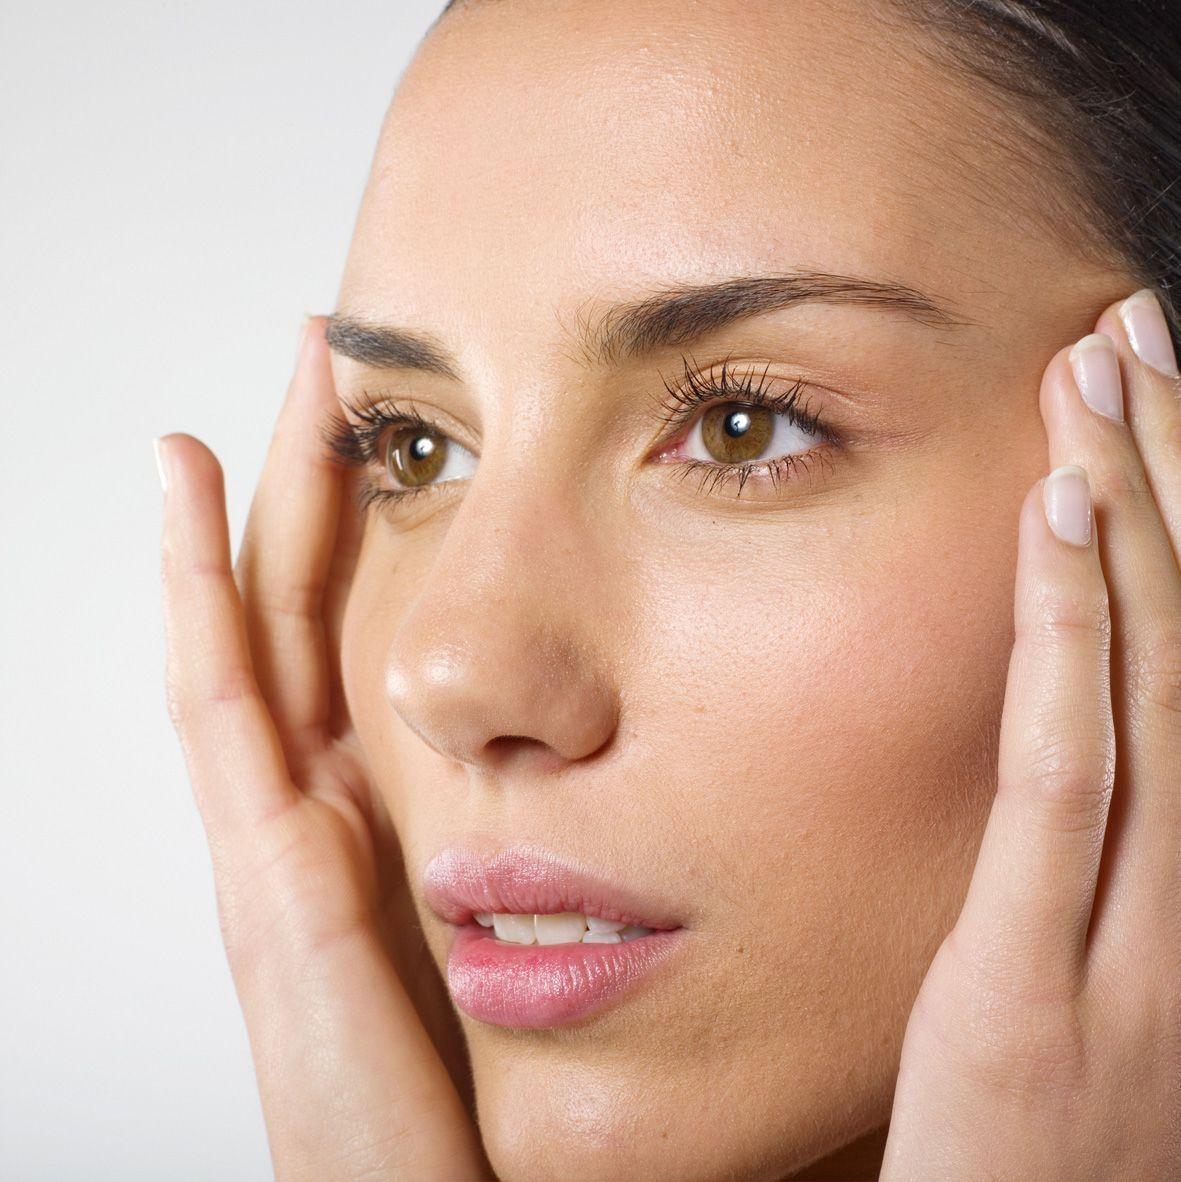 Brilliant Facial Manipulation Strategies For Generating Beautiful